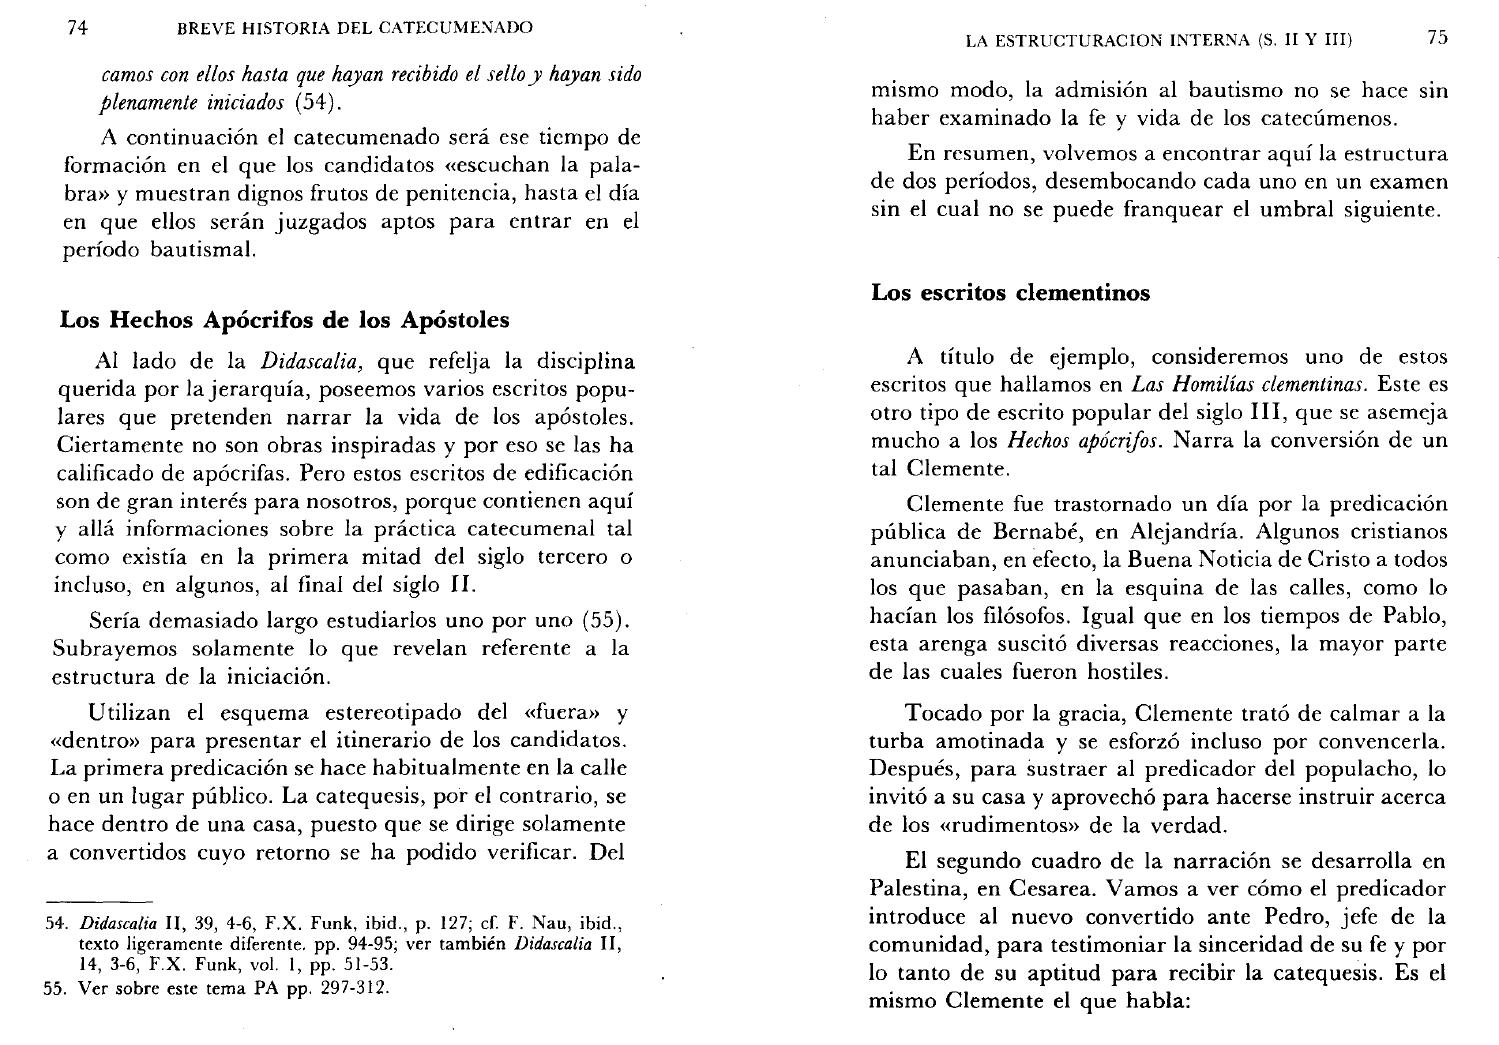 Breve Historia Del Catecumenado By Alex Molina Issuu